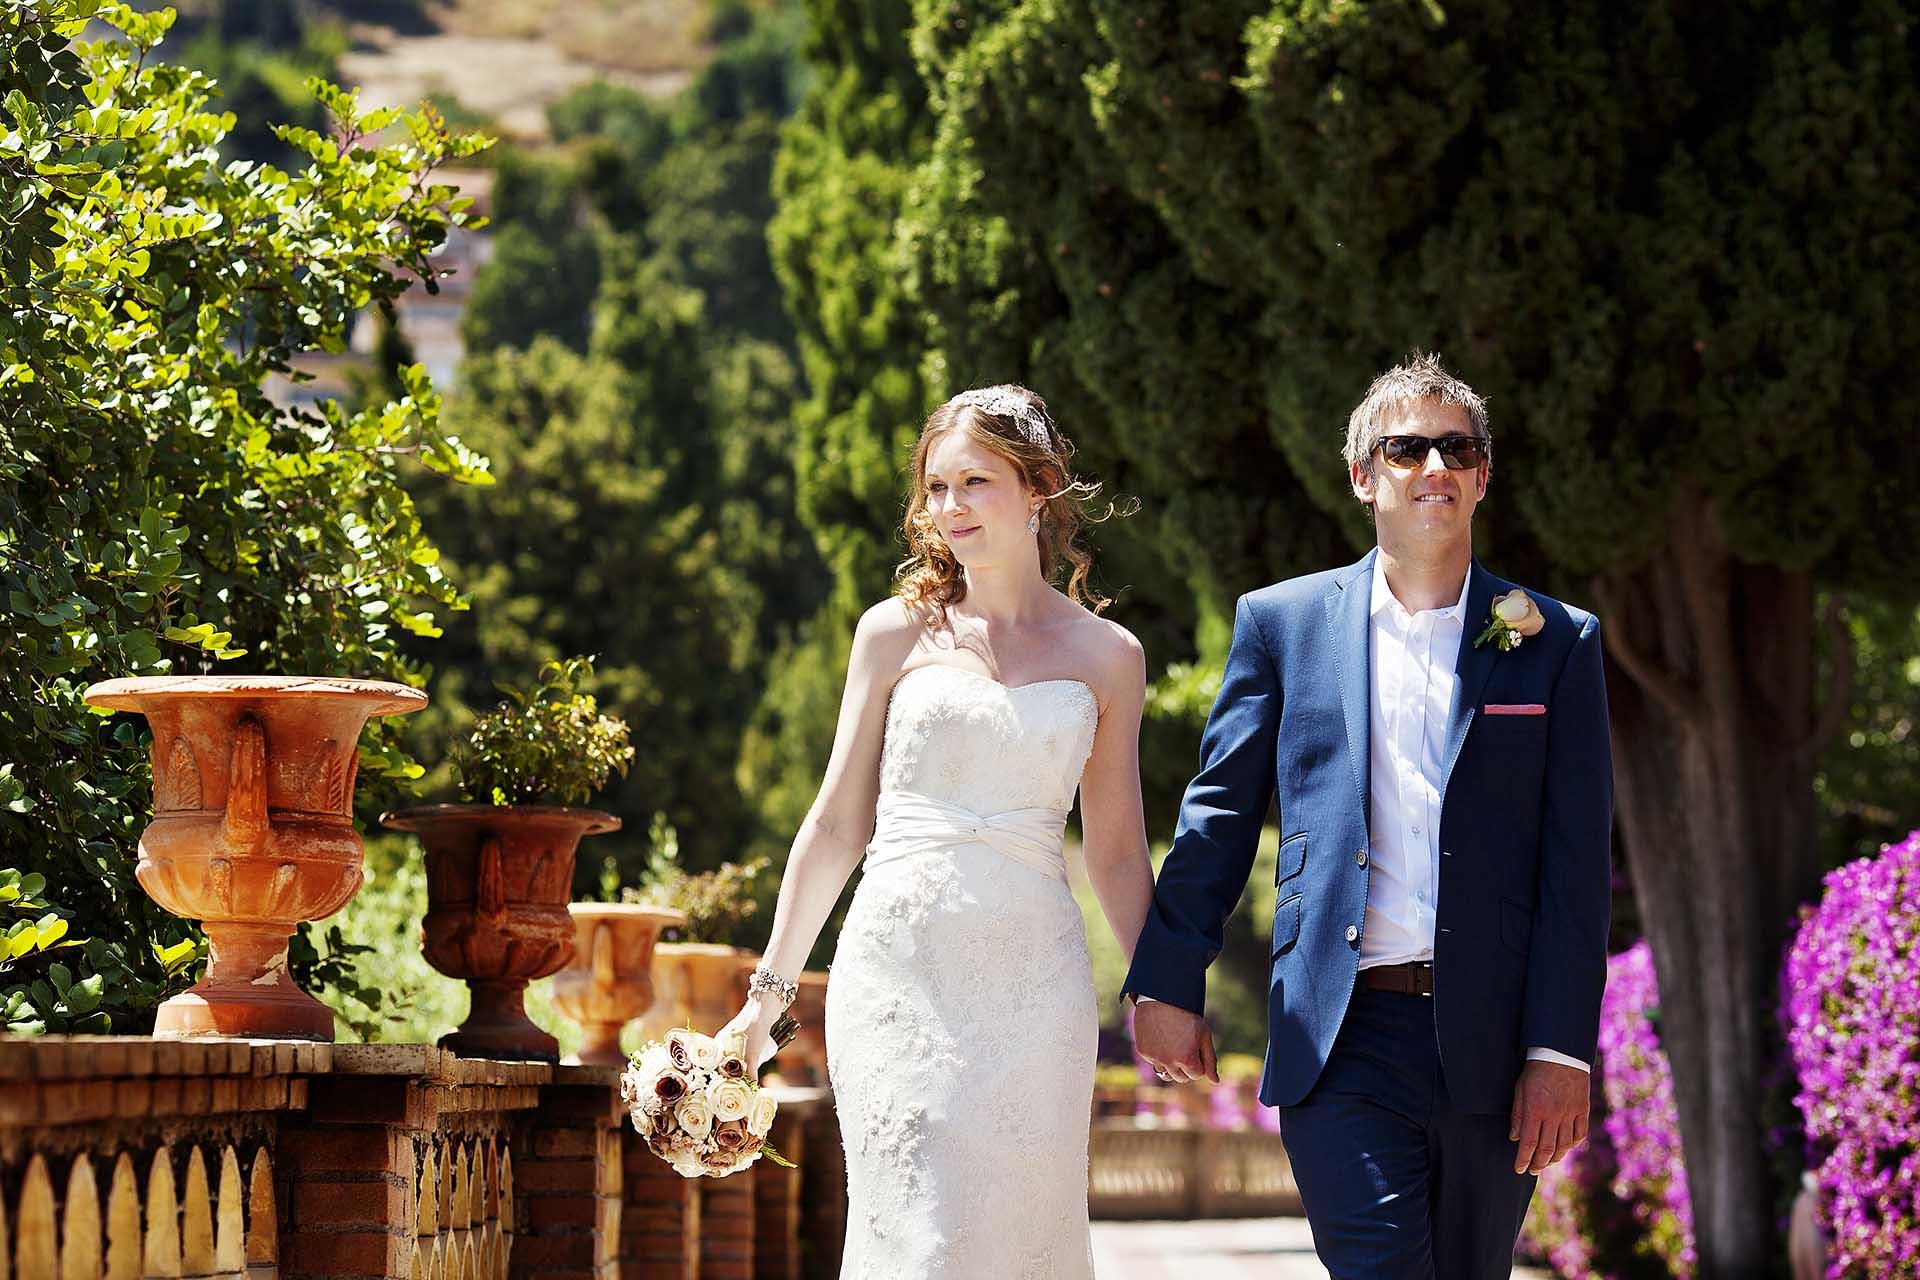 Sposi che Passeggiano ai Giardini di Taormina